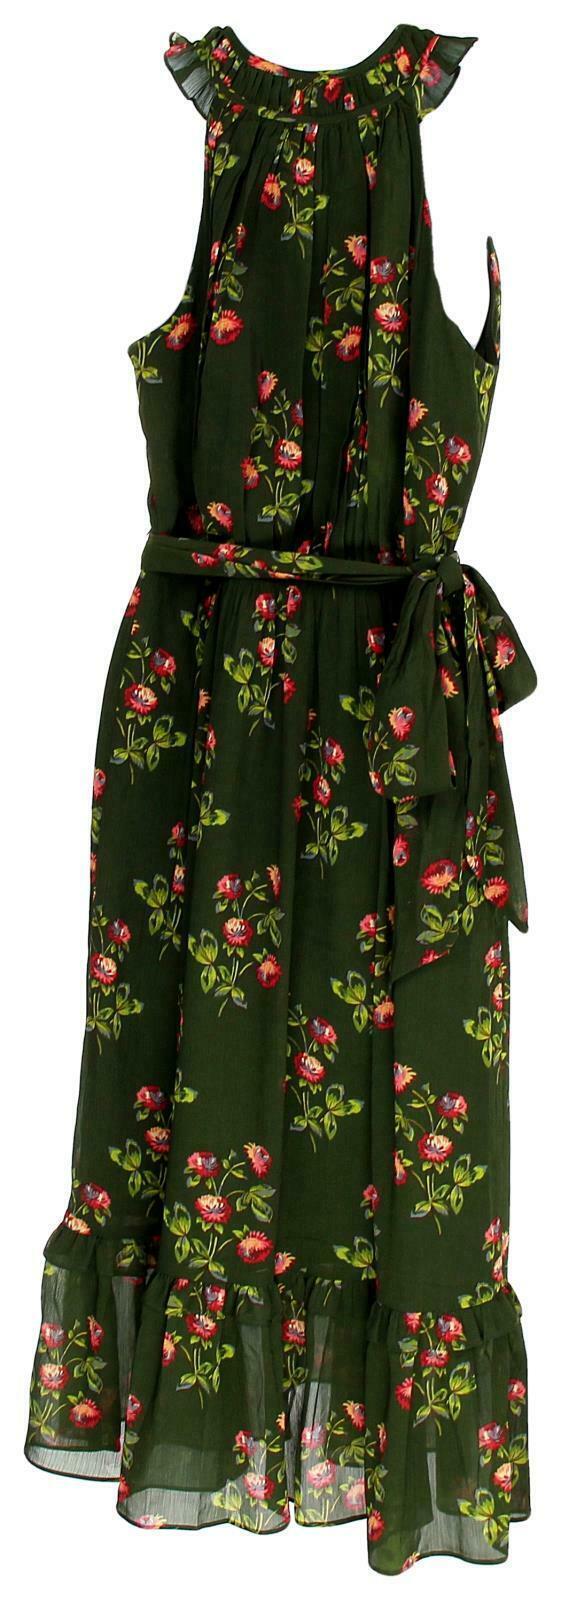 J Crew Women's Point Sur High-Neck Ruffle Floral Dress Chiffon 4 J5088 image 6